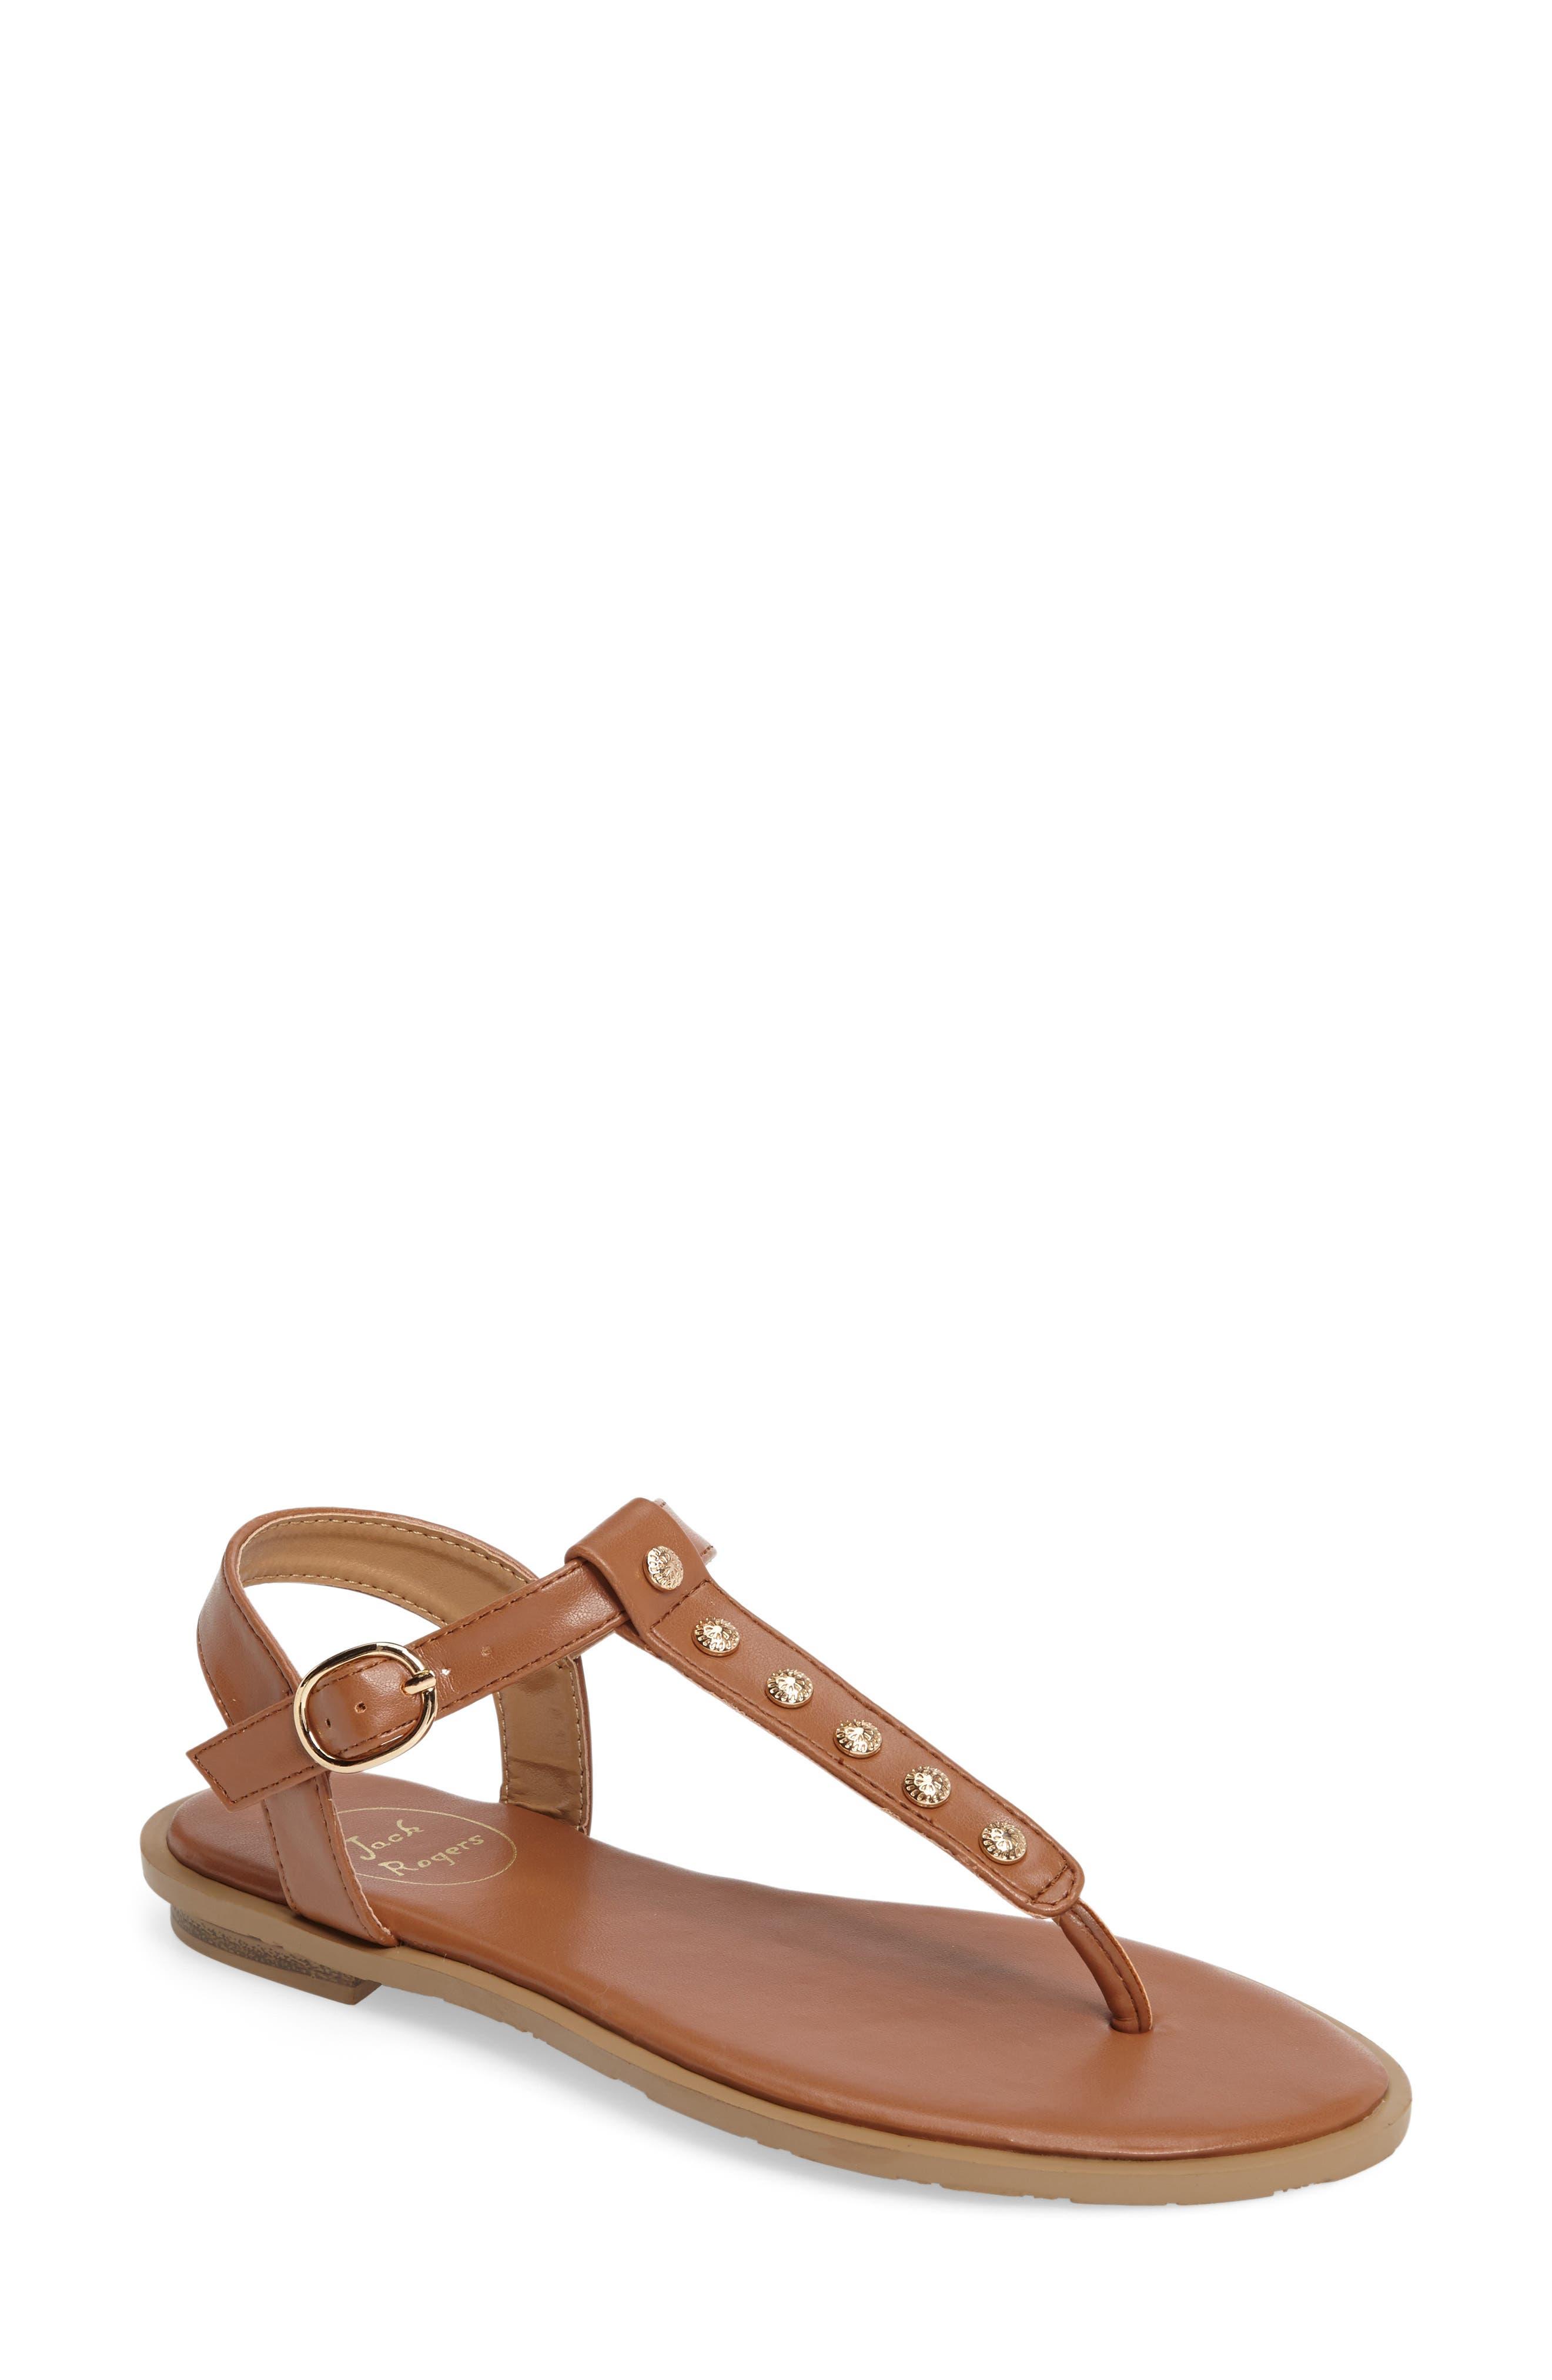 Alternate Image 1 Selected - Jack Rogers Kamri T-Strap Sandal (Women)